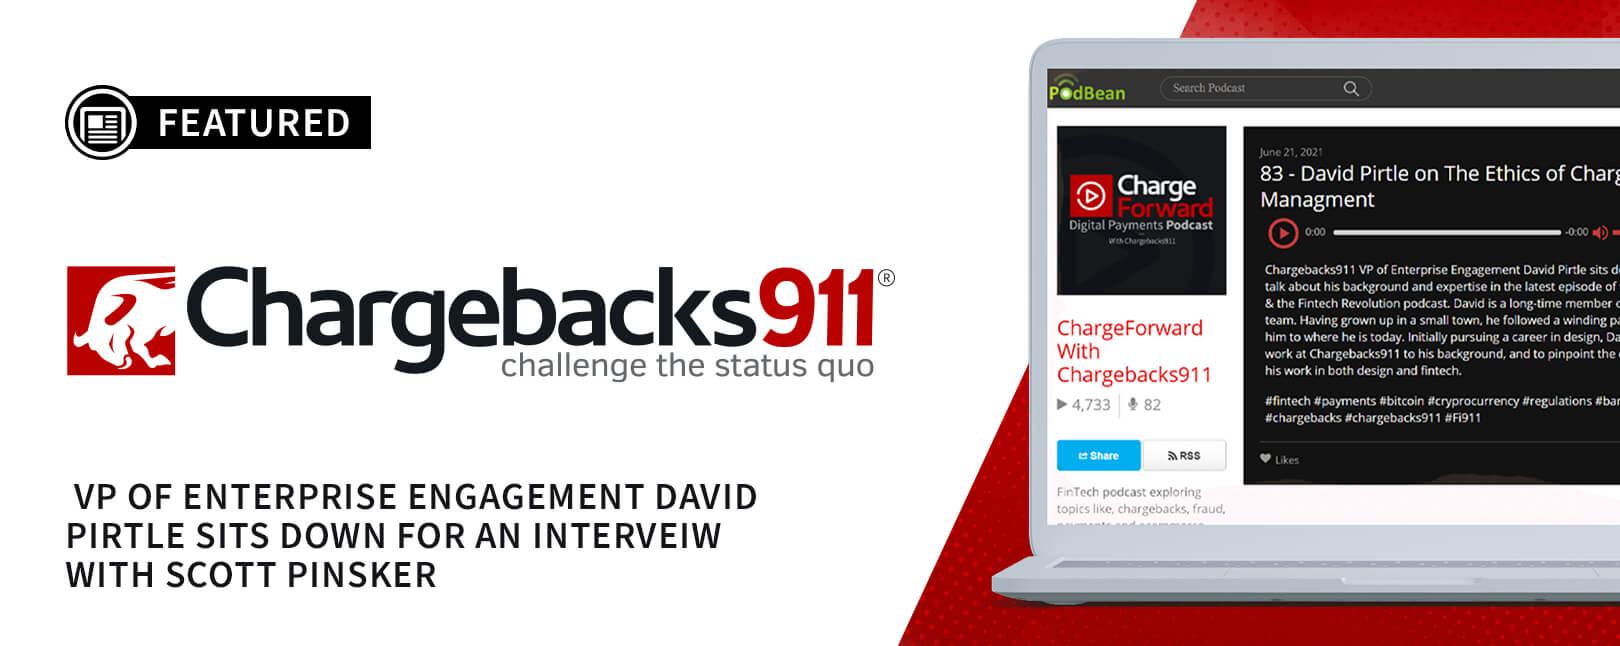 Chargebacks911® Enterprise Engagement VP Interviewed by Fintech Podcast